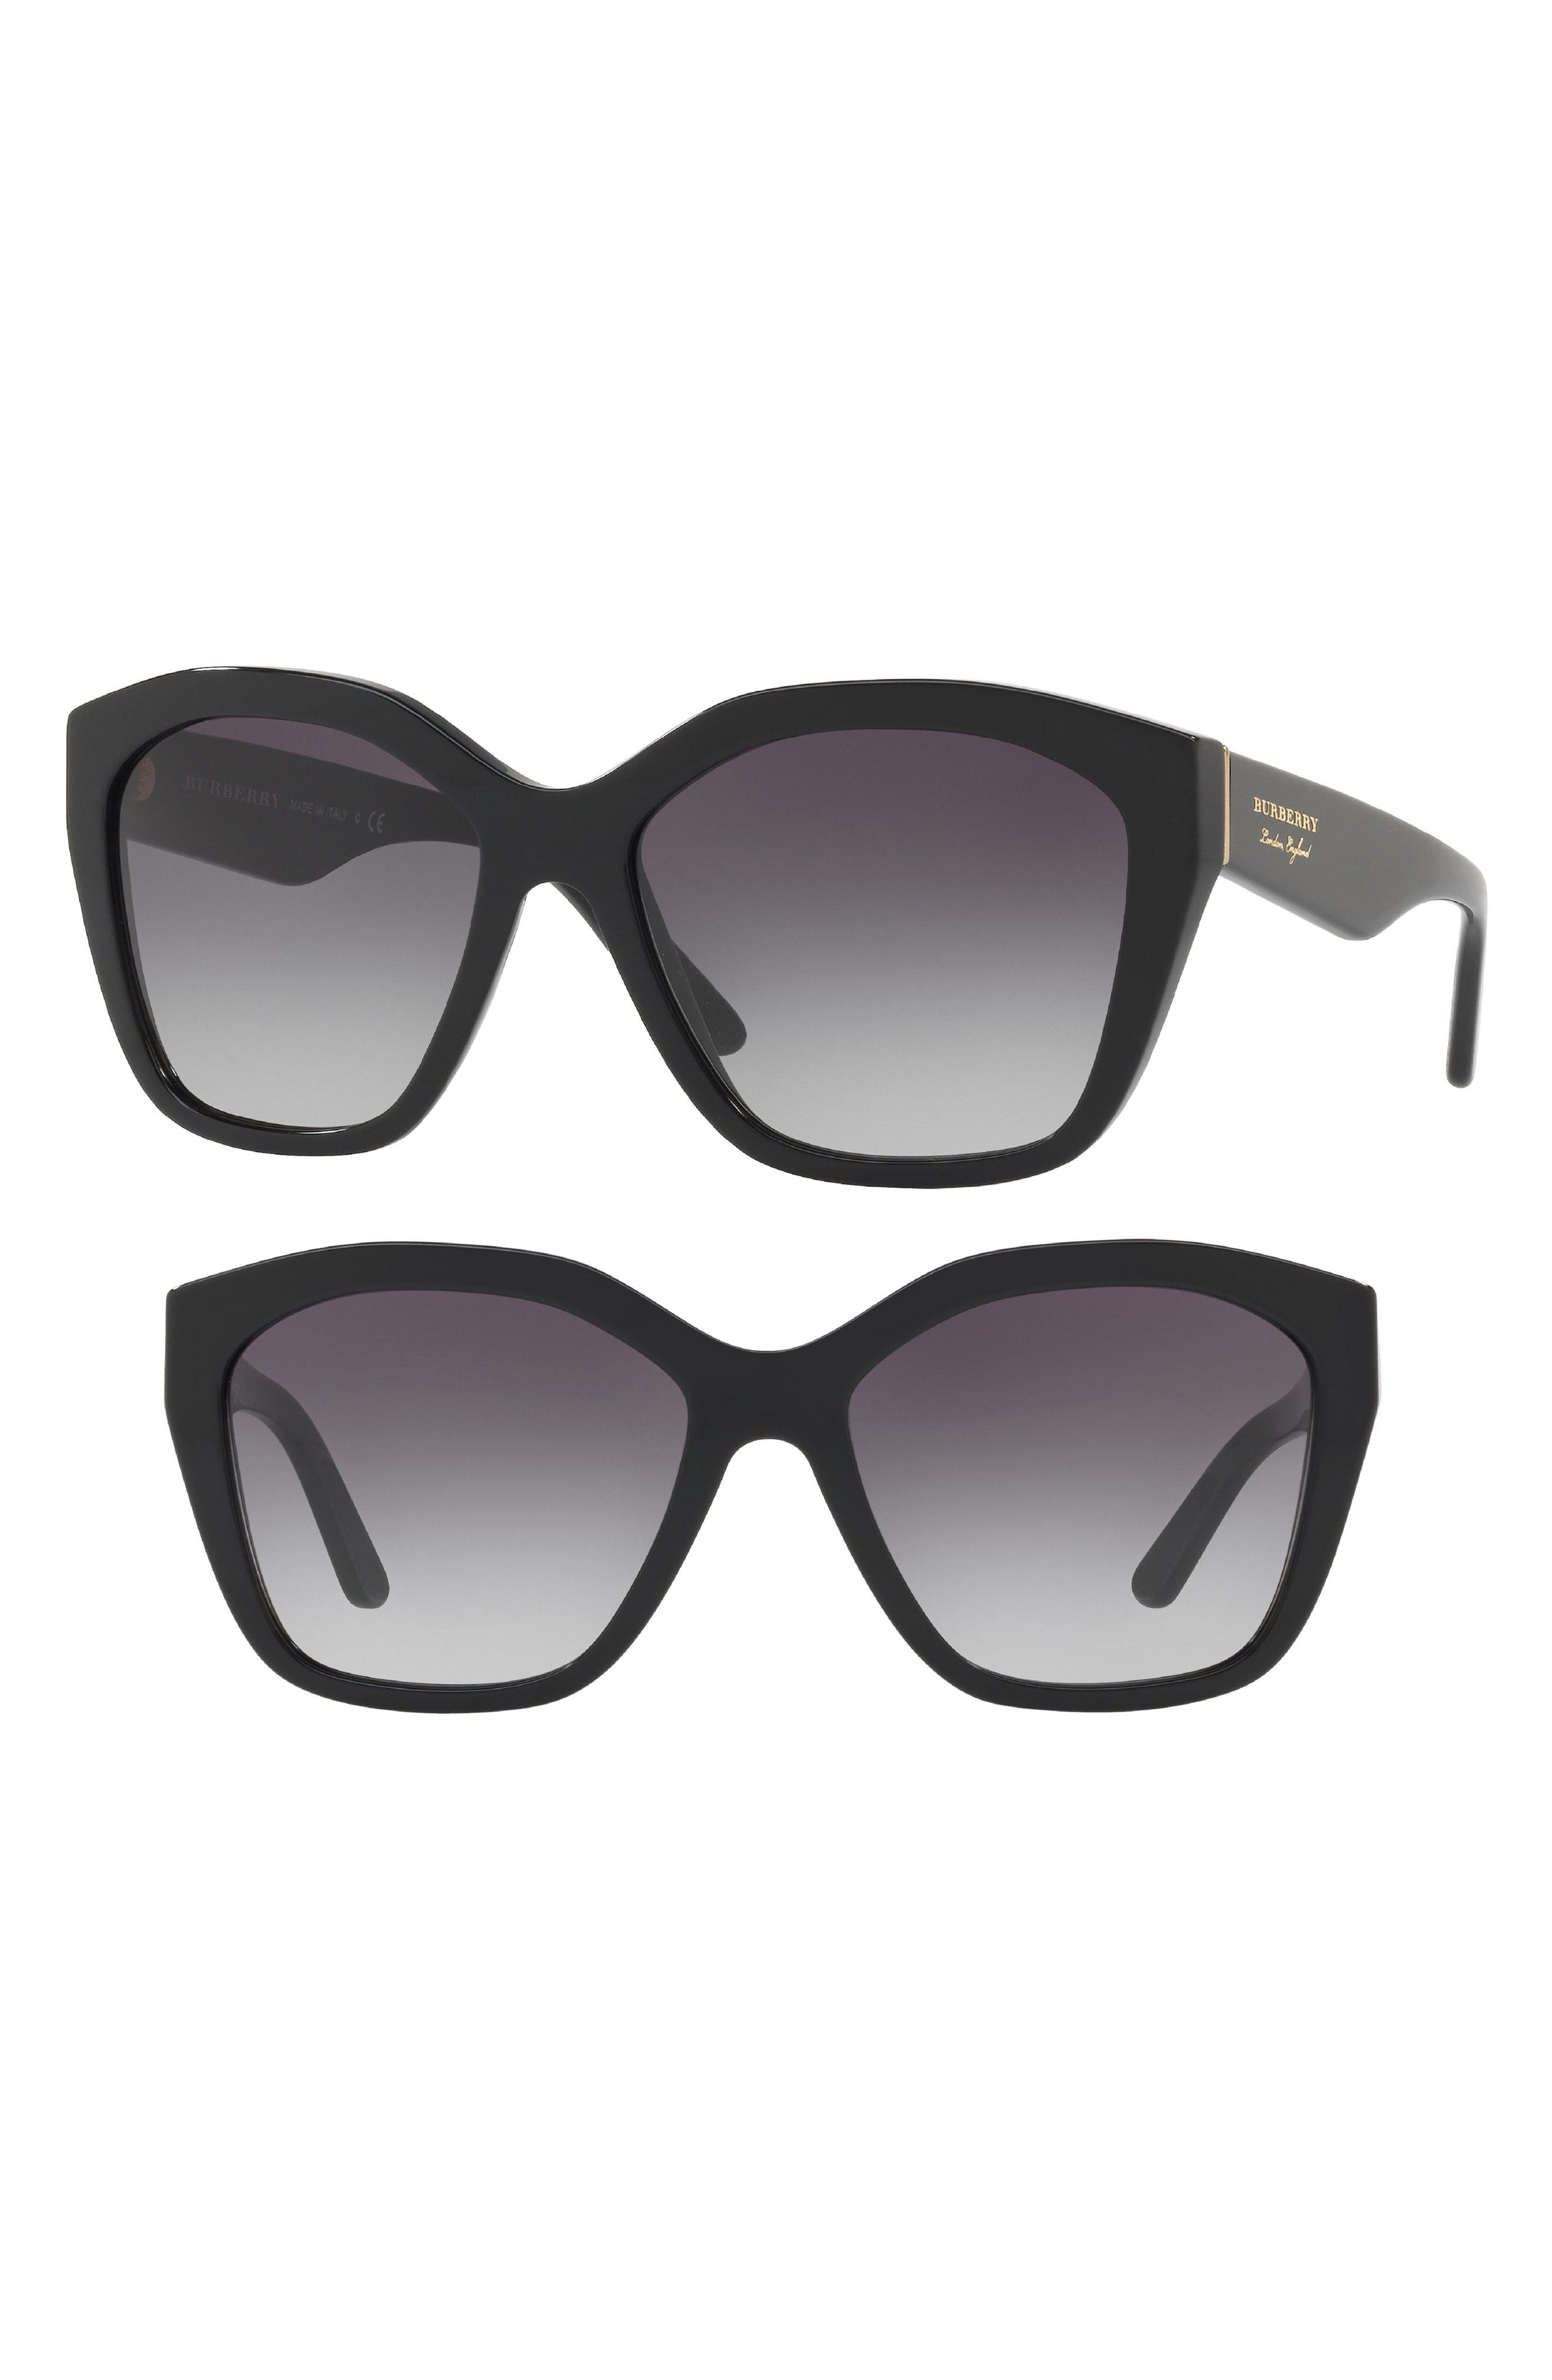 Main Image - Burberry 57mm Gradient Sunglasses